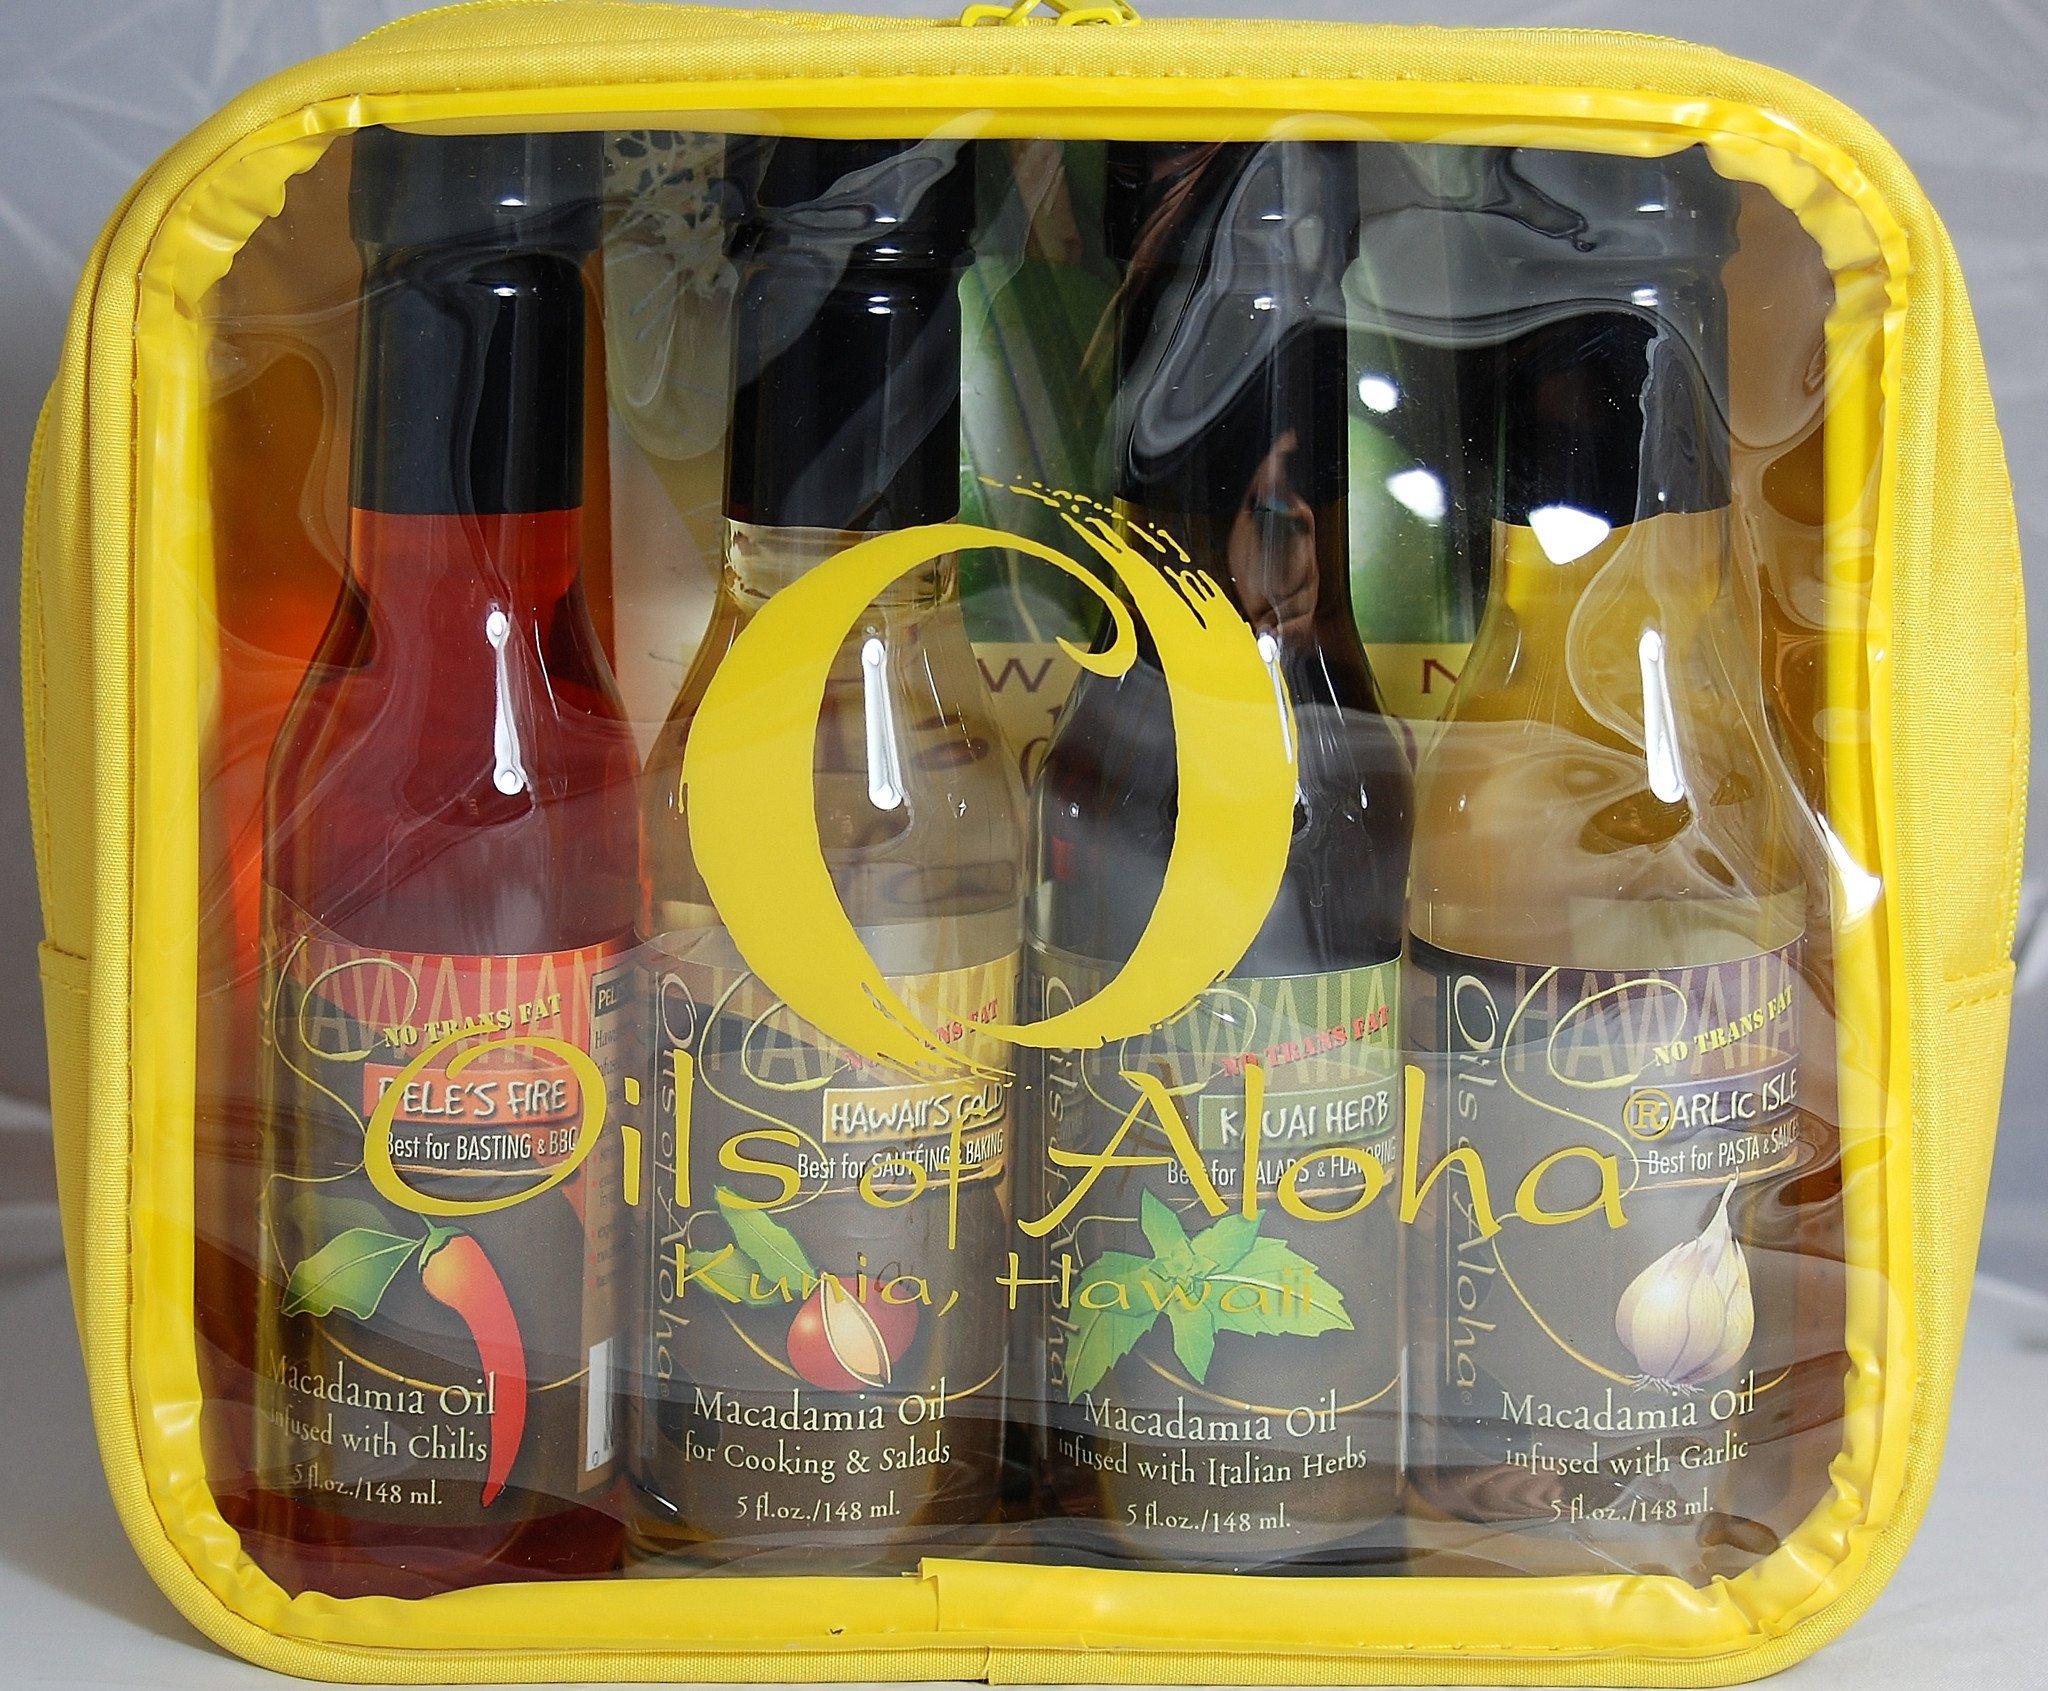 Tutu's Pantry - Kauai Herb Macadamia Nut Oil 5 ounces - 11